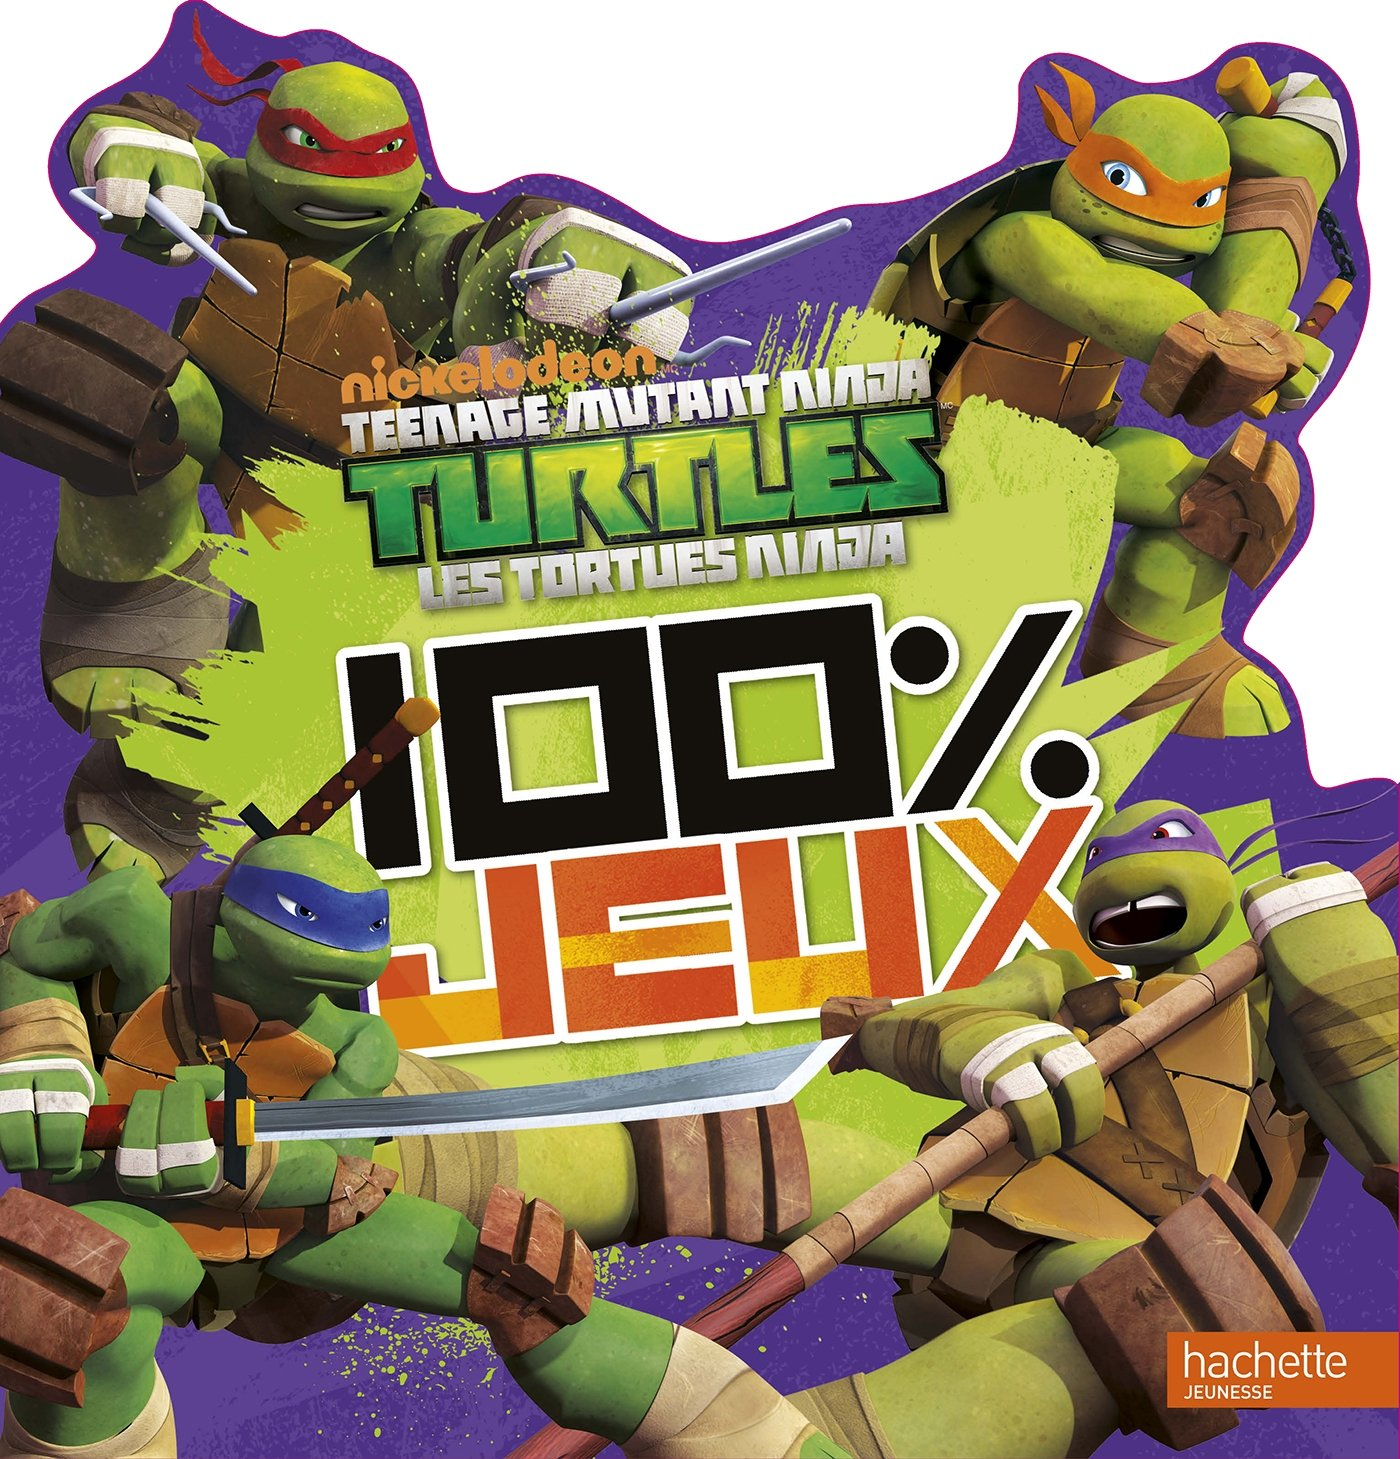 Tortues Ninja / 100% jeux: 9782010011160: Amazon.com: Books